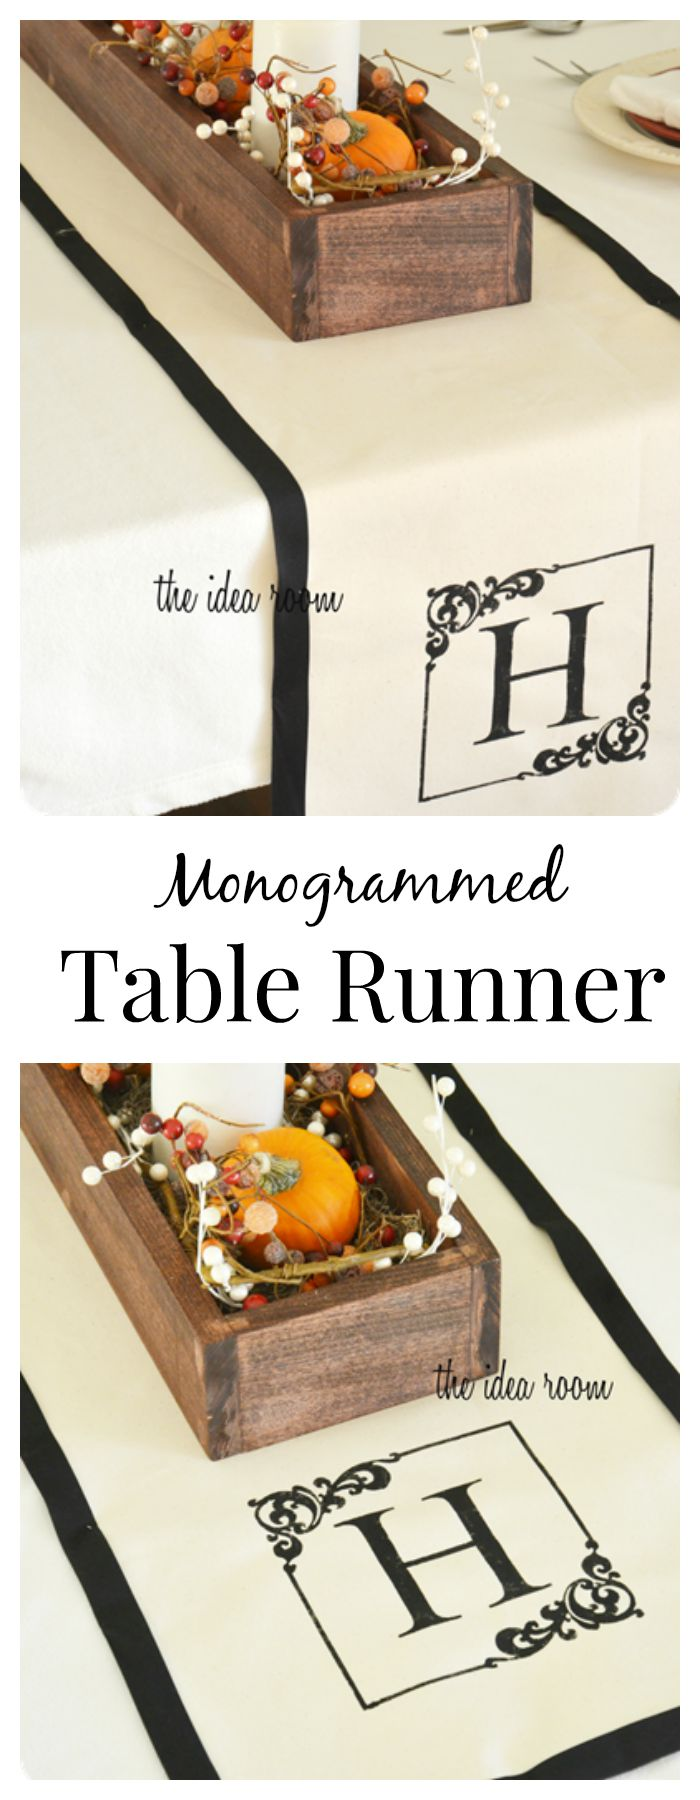 DIY-Monogrammed-Table-Runner